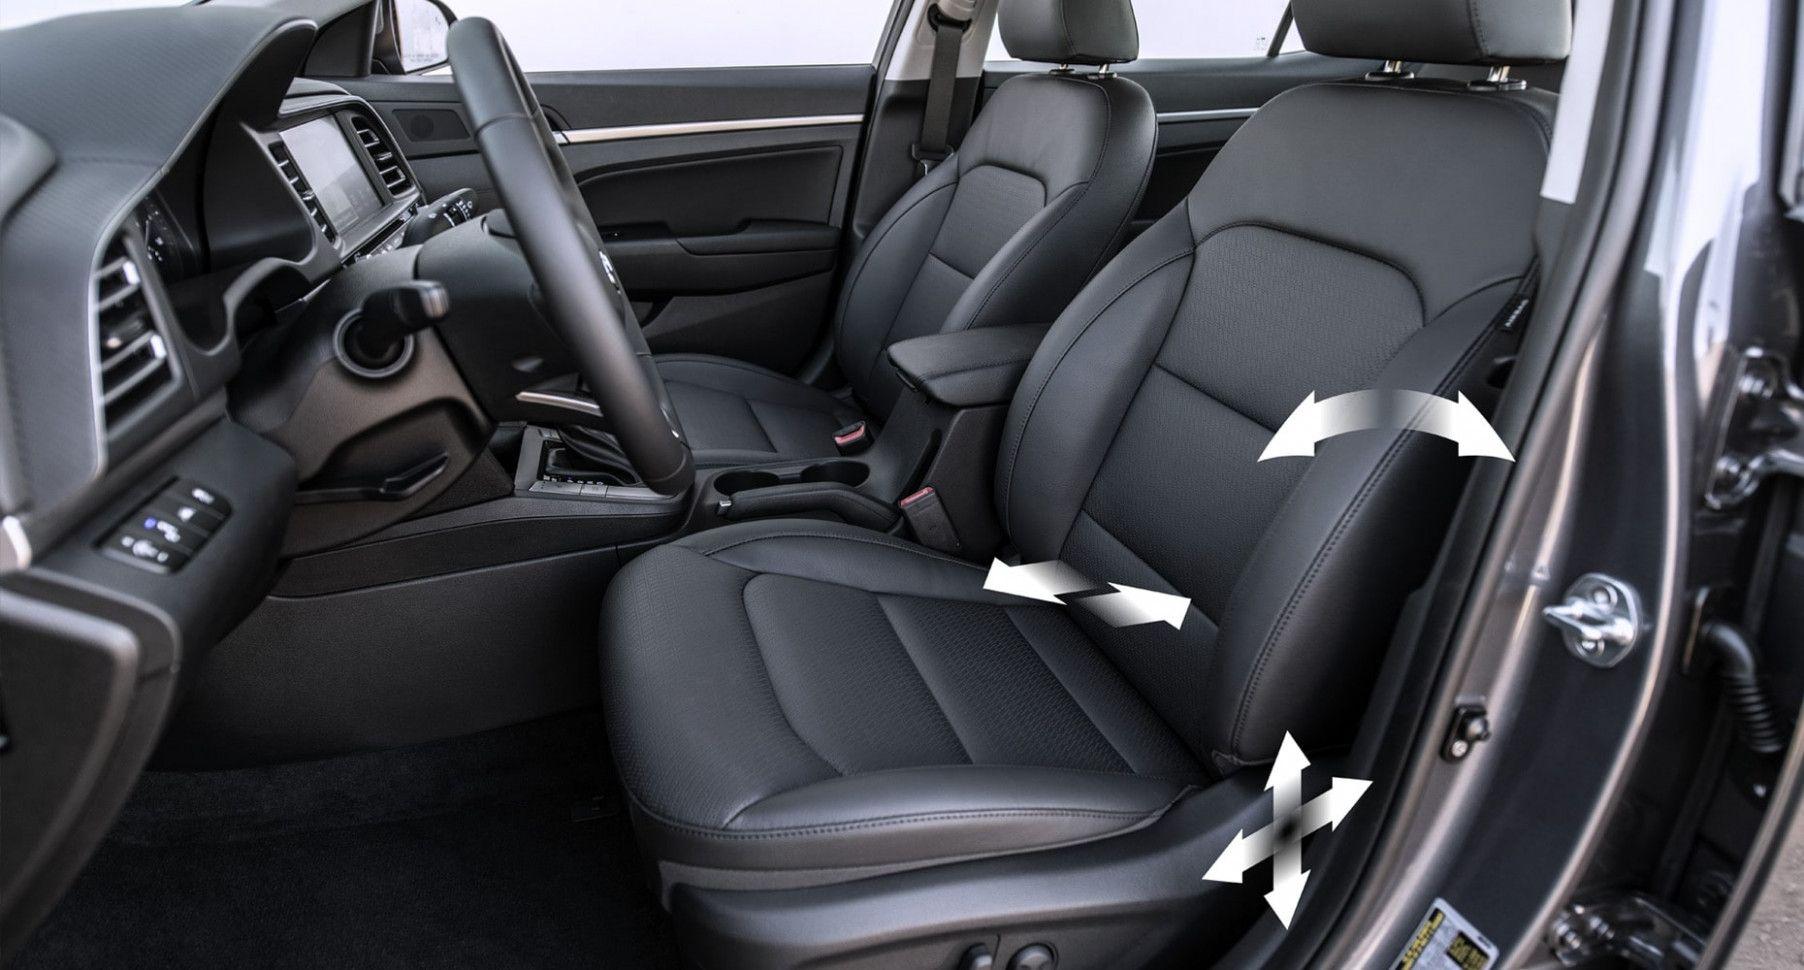 Park Art|My WordPress Blog_2013 Hyundai Elantra Gt Seat Covers